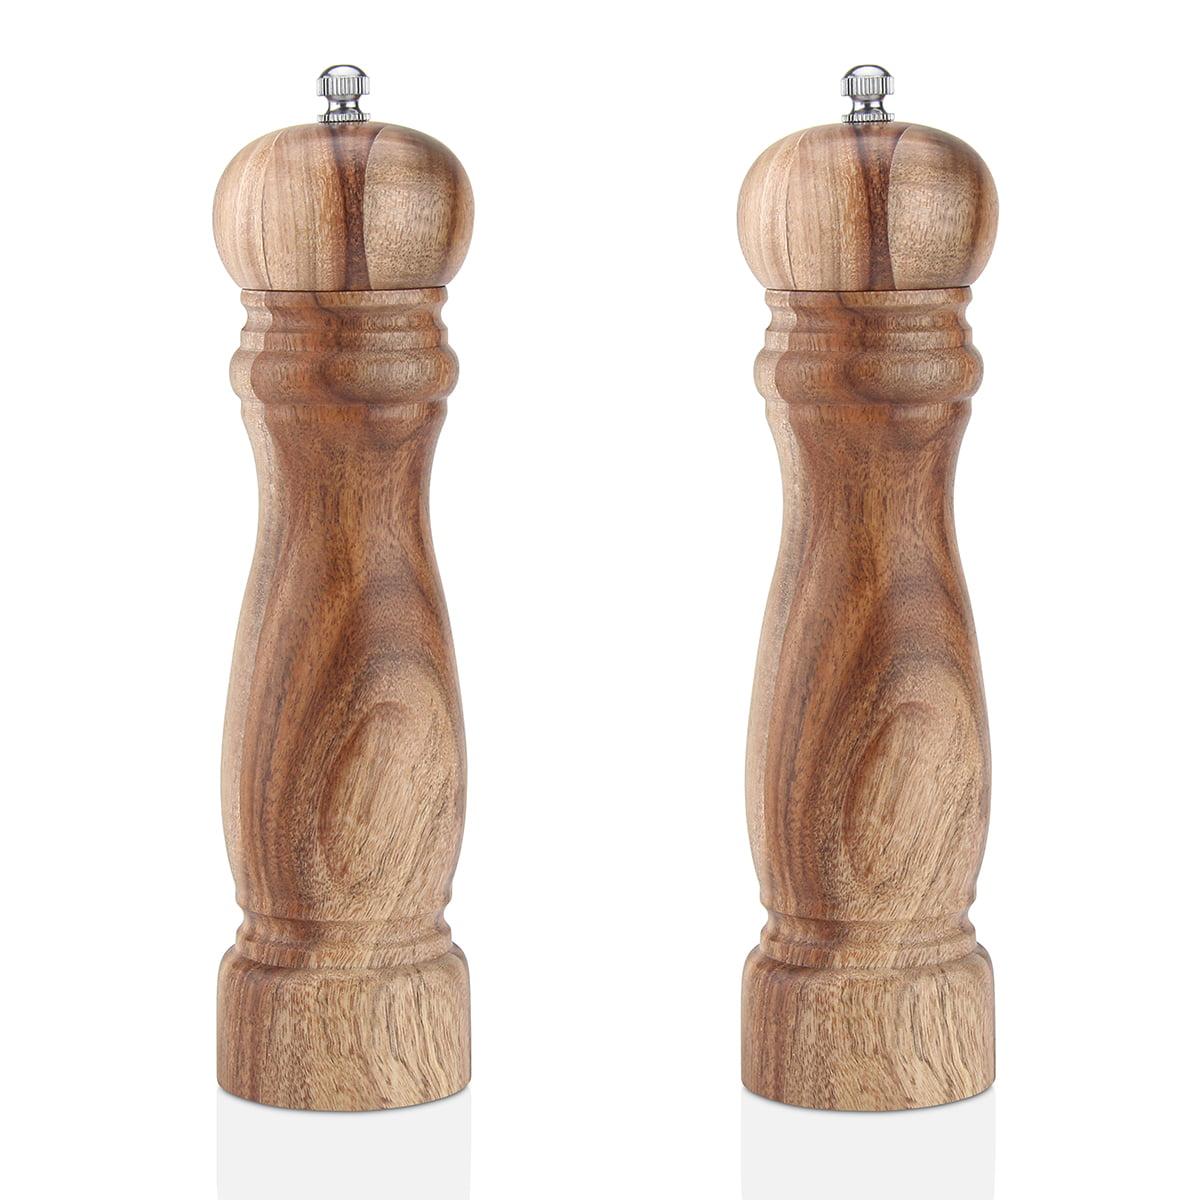 8 inch Wooden Pepper Mill Manual Ceramic Core Salt Pepper Spice Grinders Hand Shaker Cruet (2 Pack) by